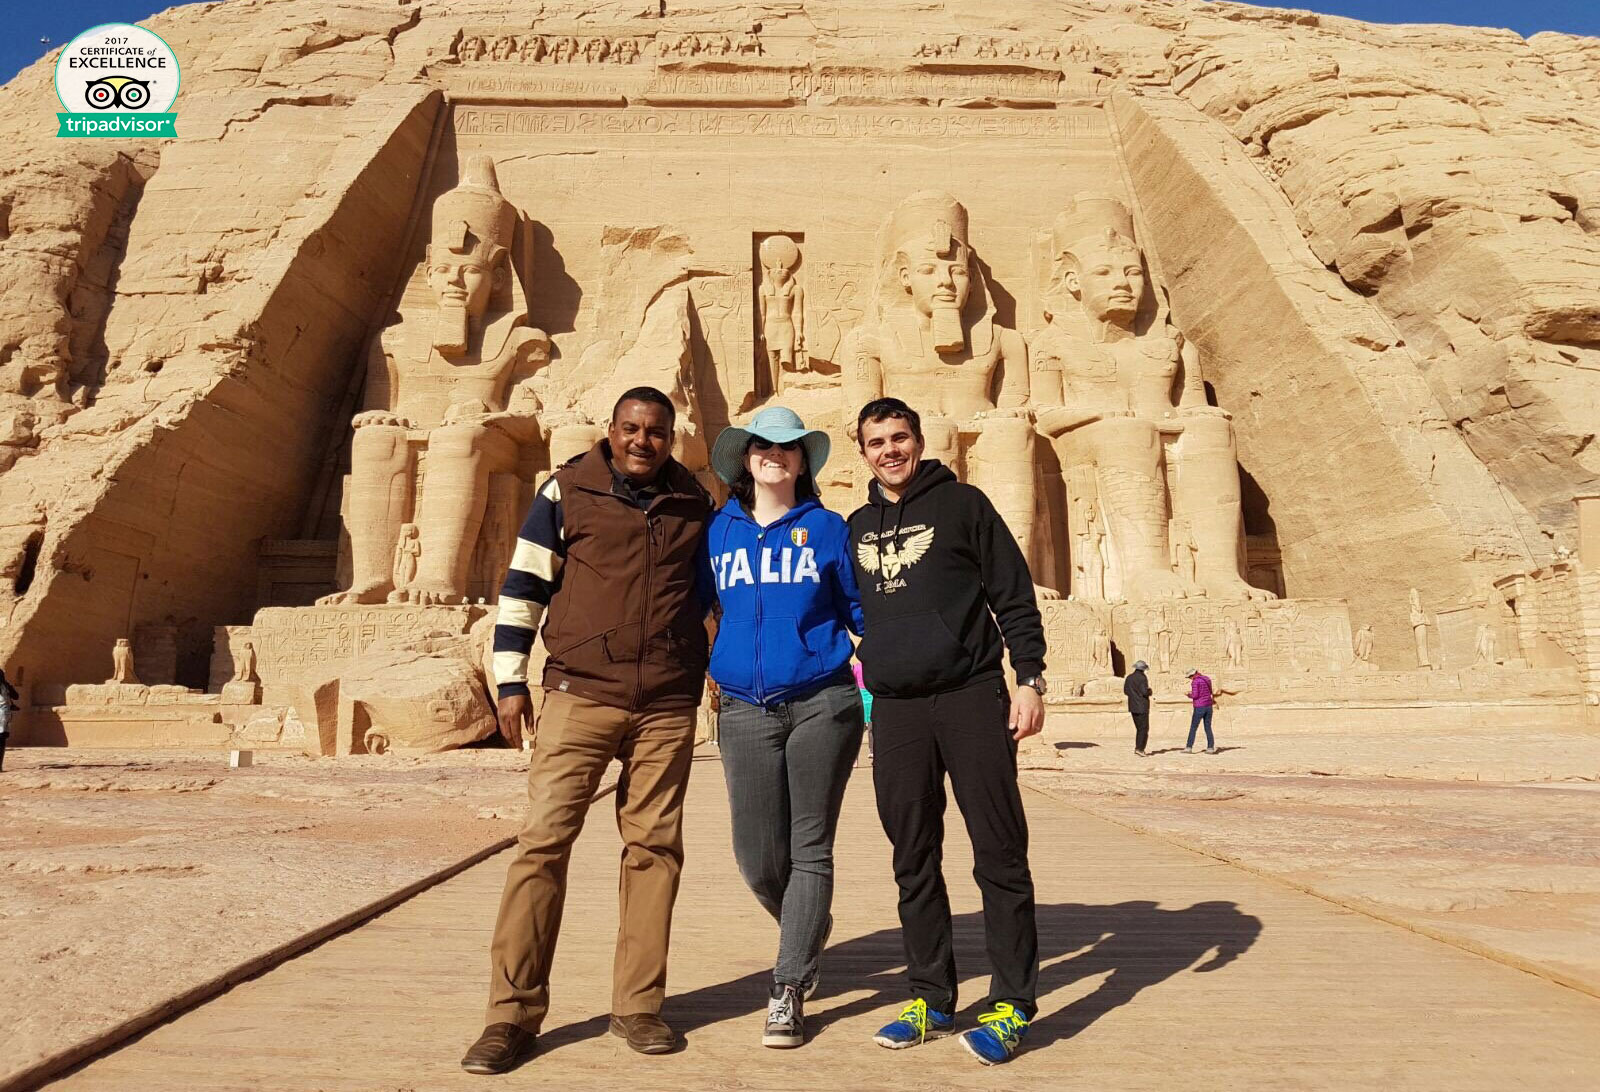 Abu Simbel Temple - 6 Days Egypt Itinerary to Cairo, Luxor, Aswan & Abu Simbel - Egypt Tours Portal